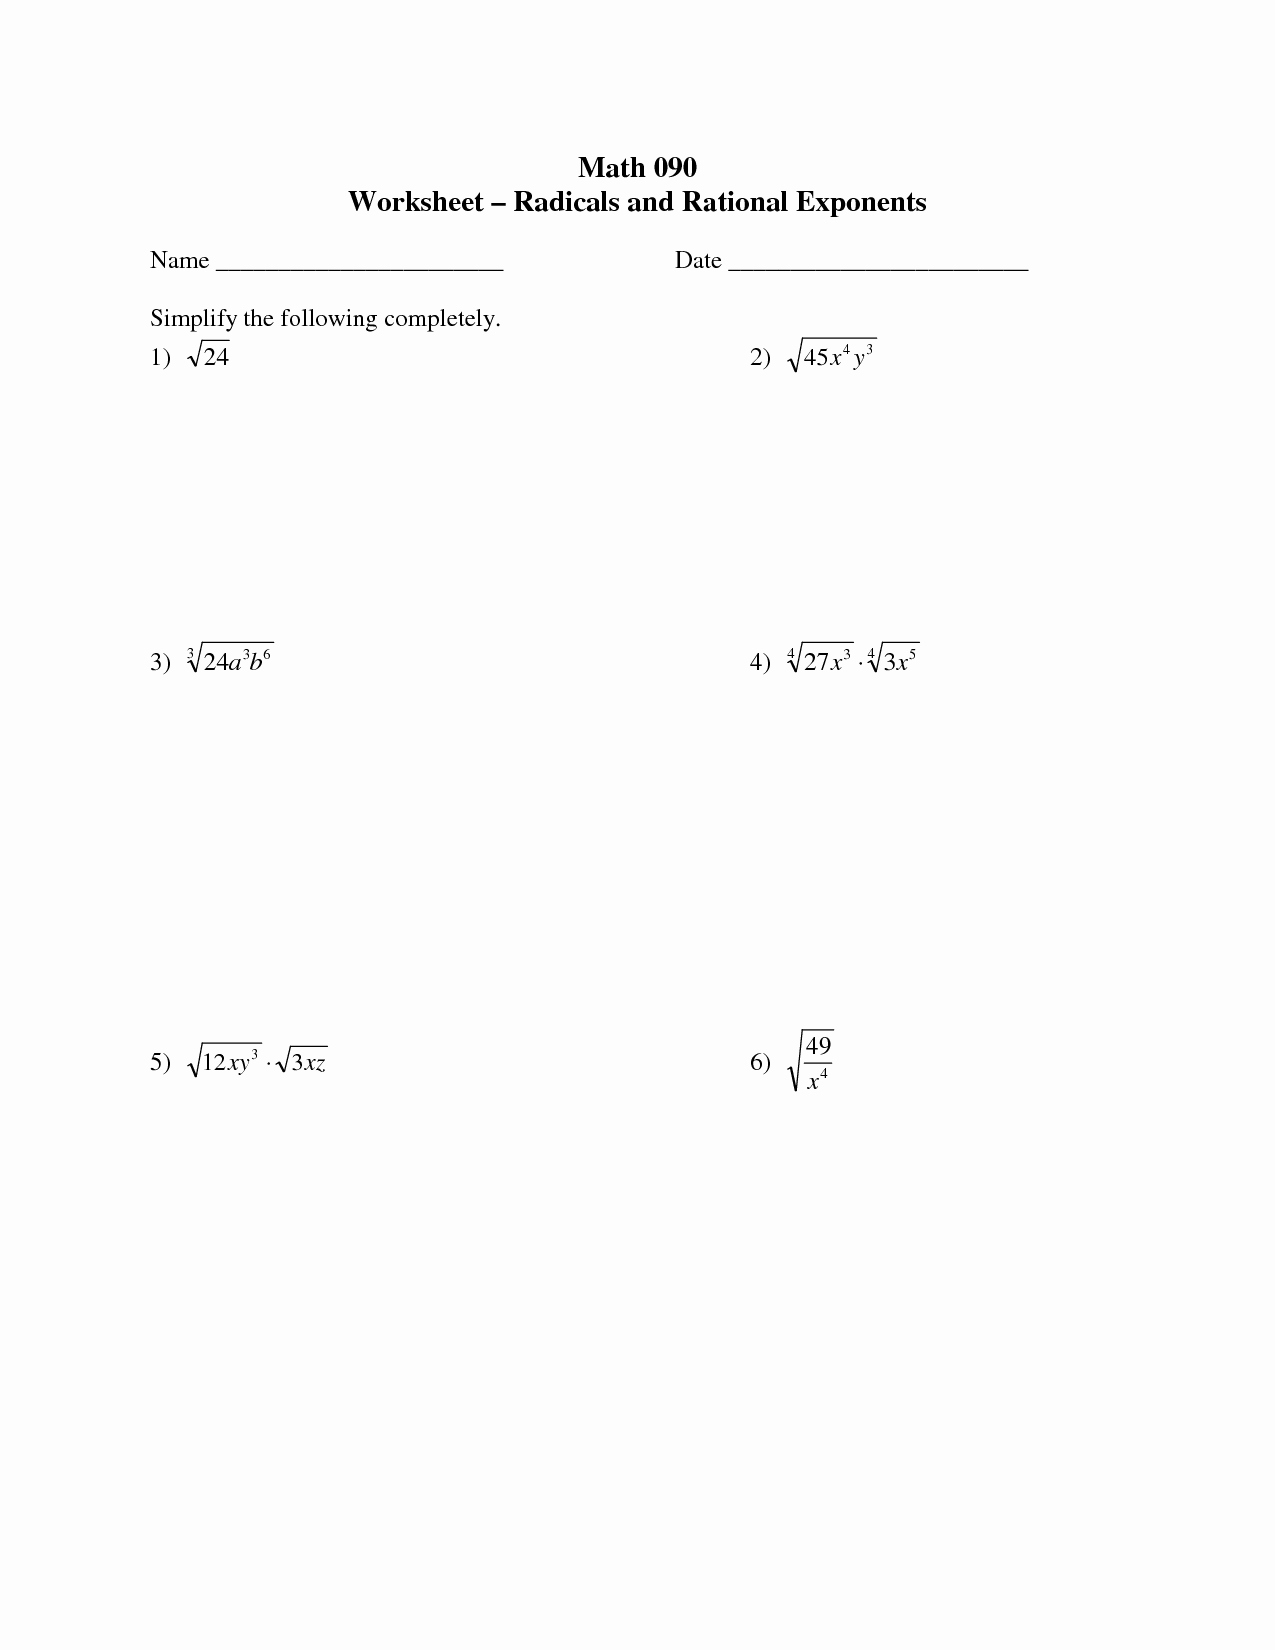 Radical and Rational Exponents Worksheet Inspirational 17 Best Of Algebra 1 Radicals Worksheet 7th Grade